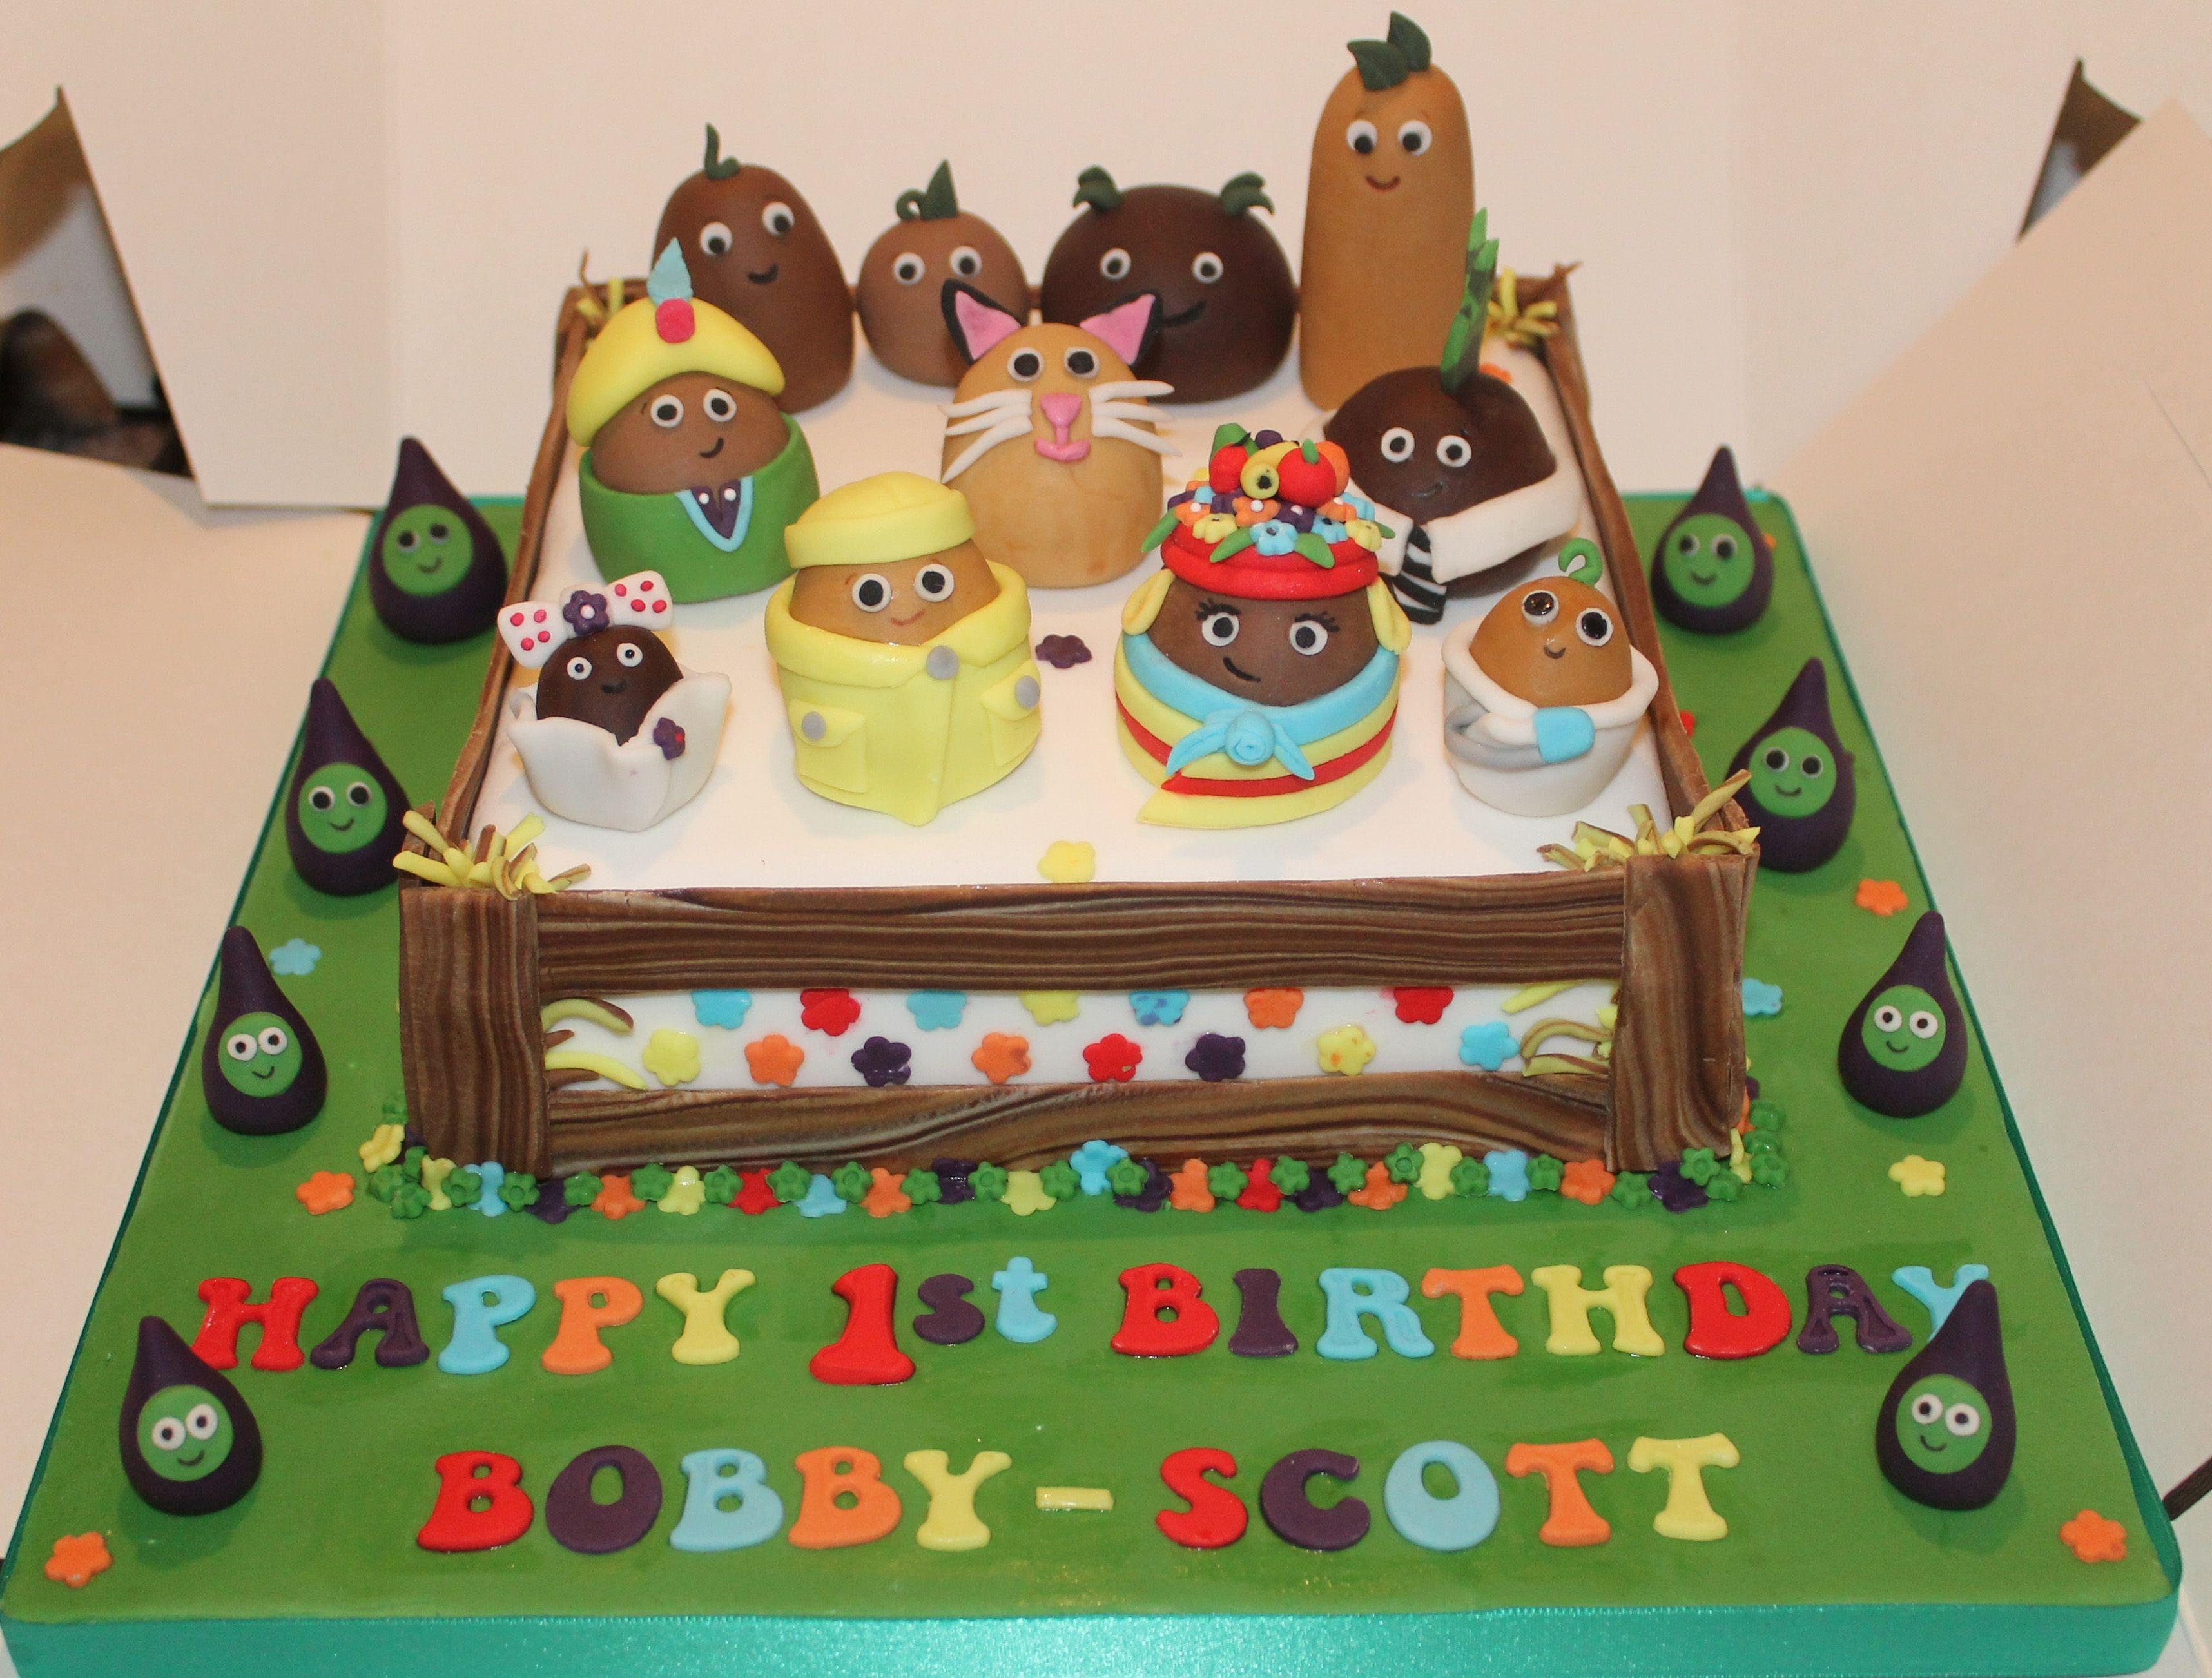 Fine Small Potatoes Cake Childrens Birthday Cakes 3Rd Birthday Cakes Personalised Birthday Cards Veneteletsinfo